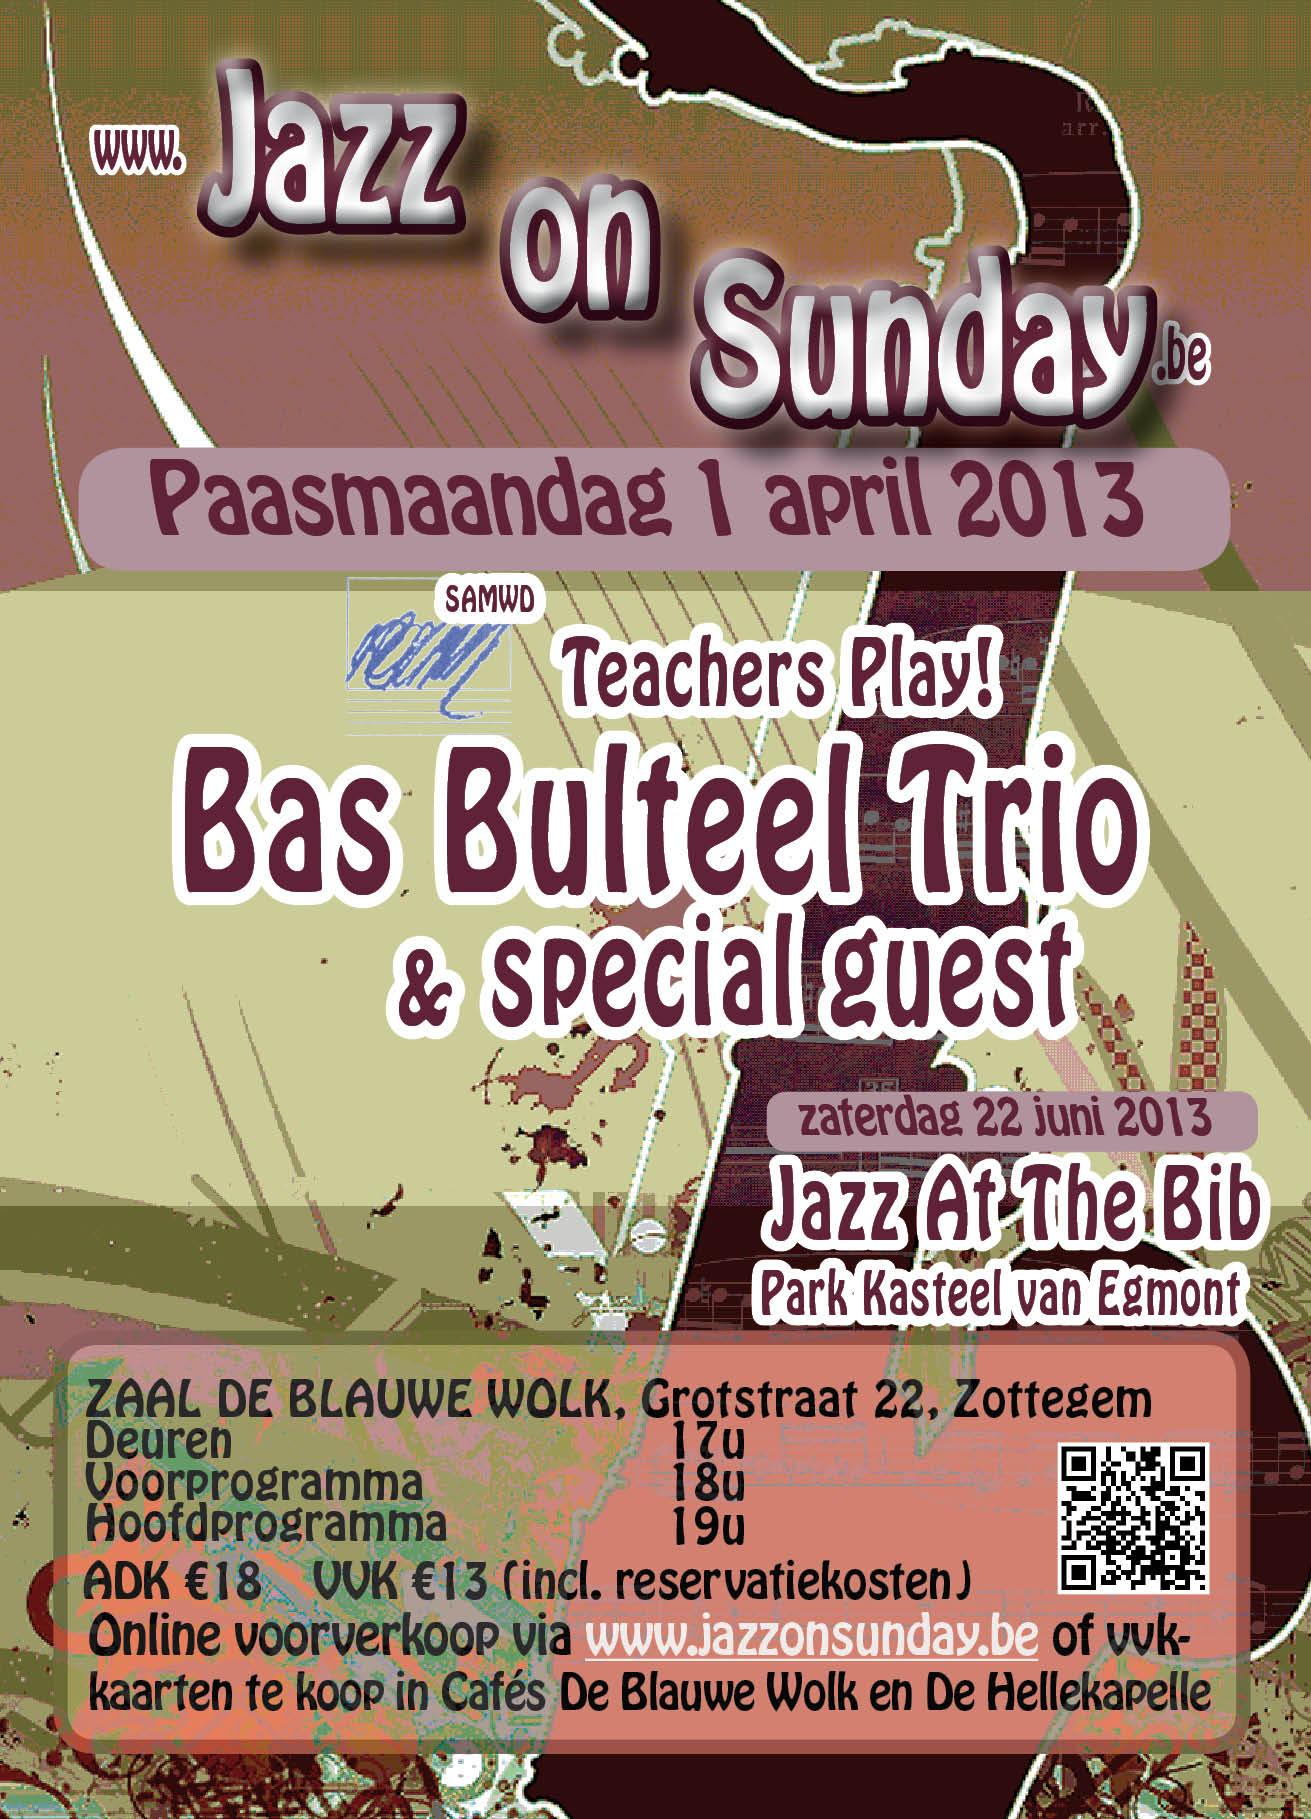 20130401-flyer-Jazz-On-Sunday-01-04-2013